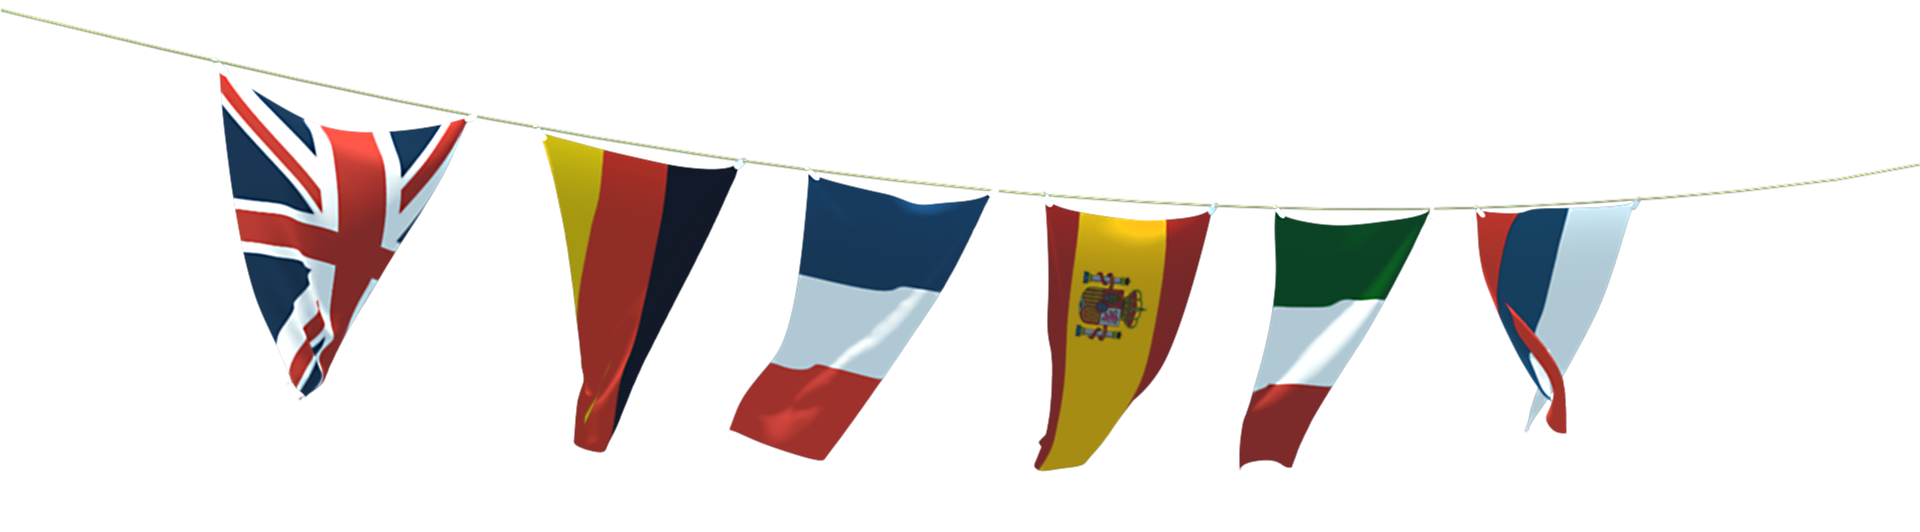 Flags_LAY_v001